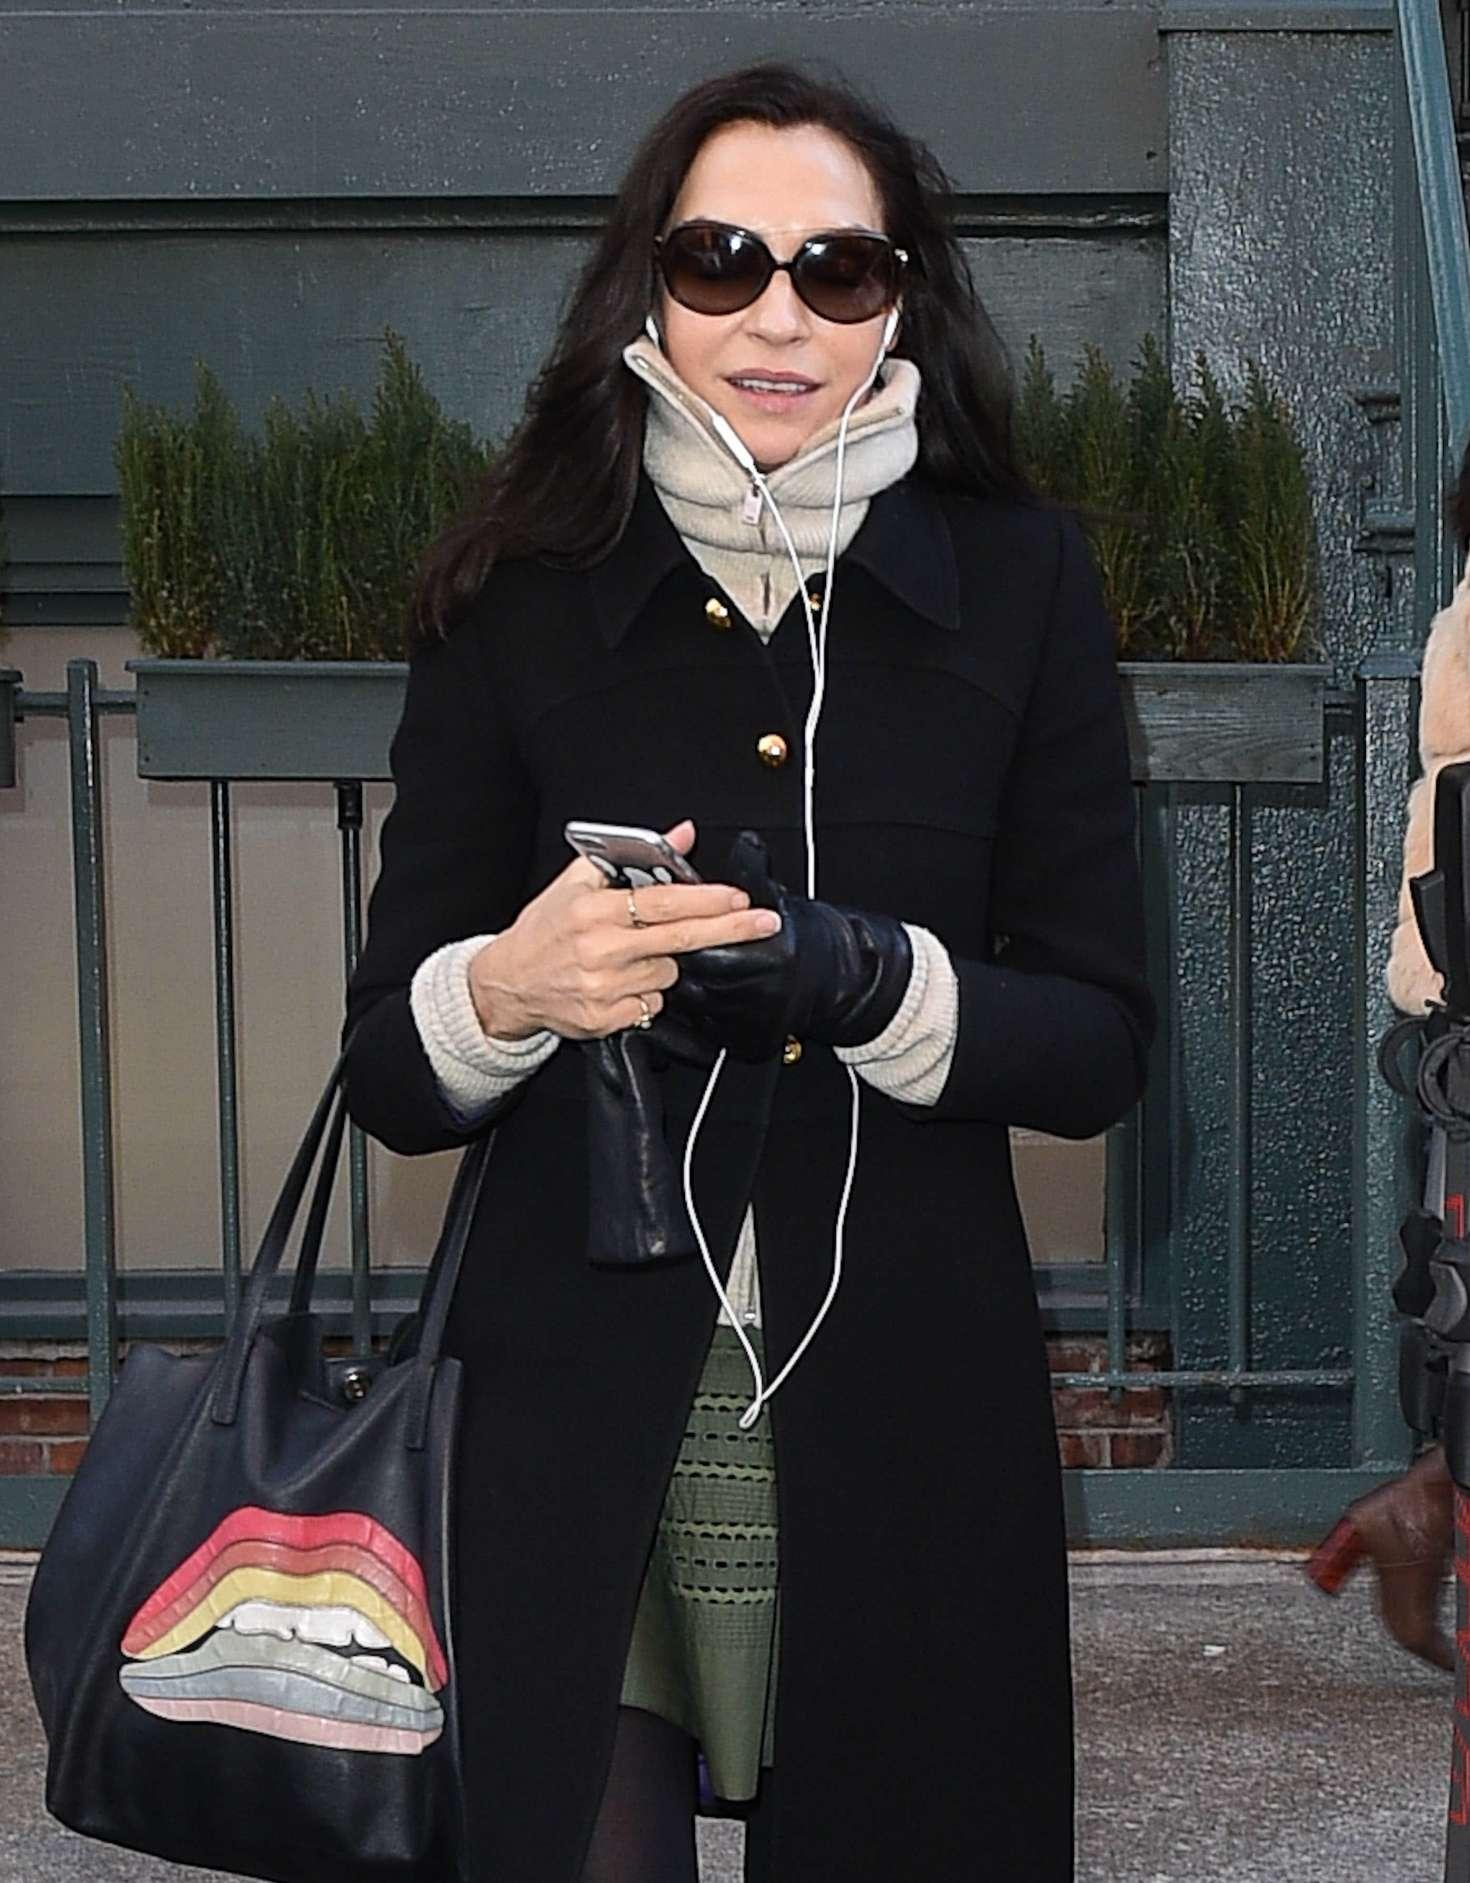 Famke Janssen in Black Coat Shopping in New York